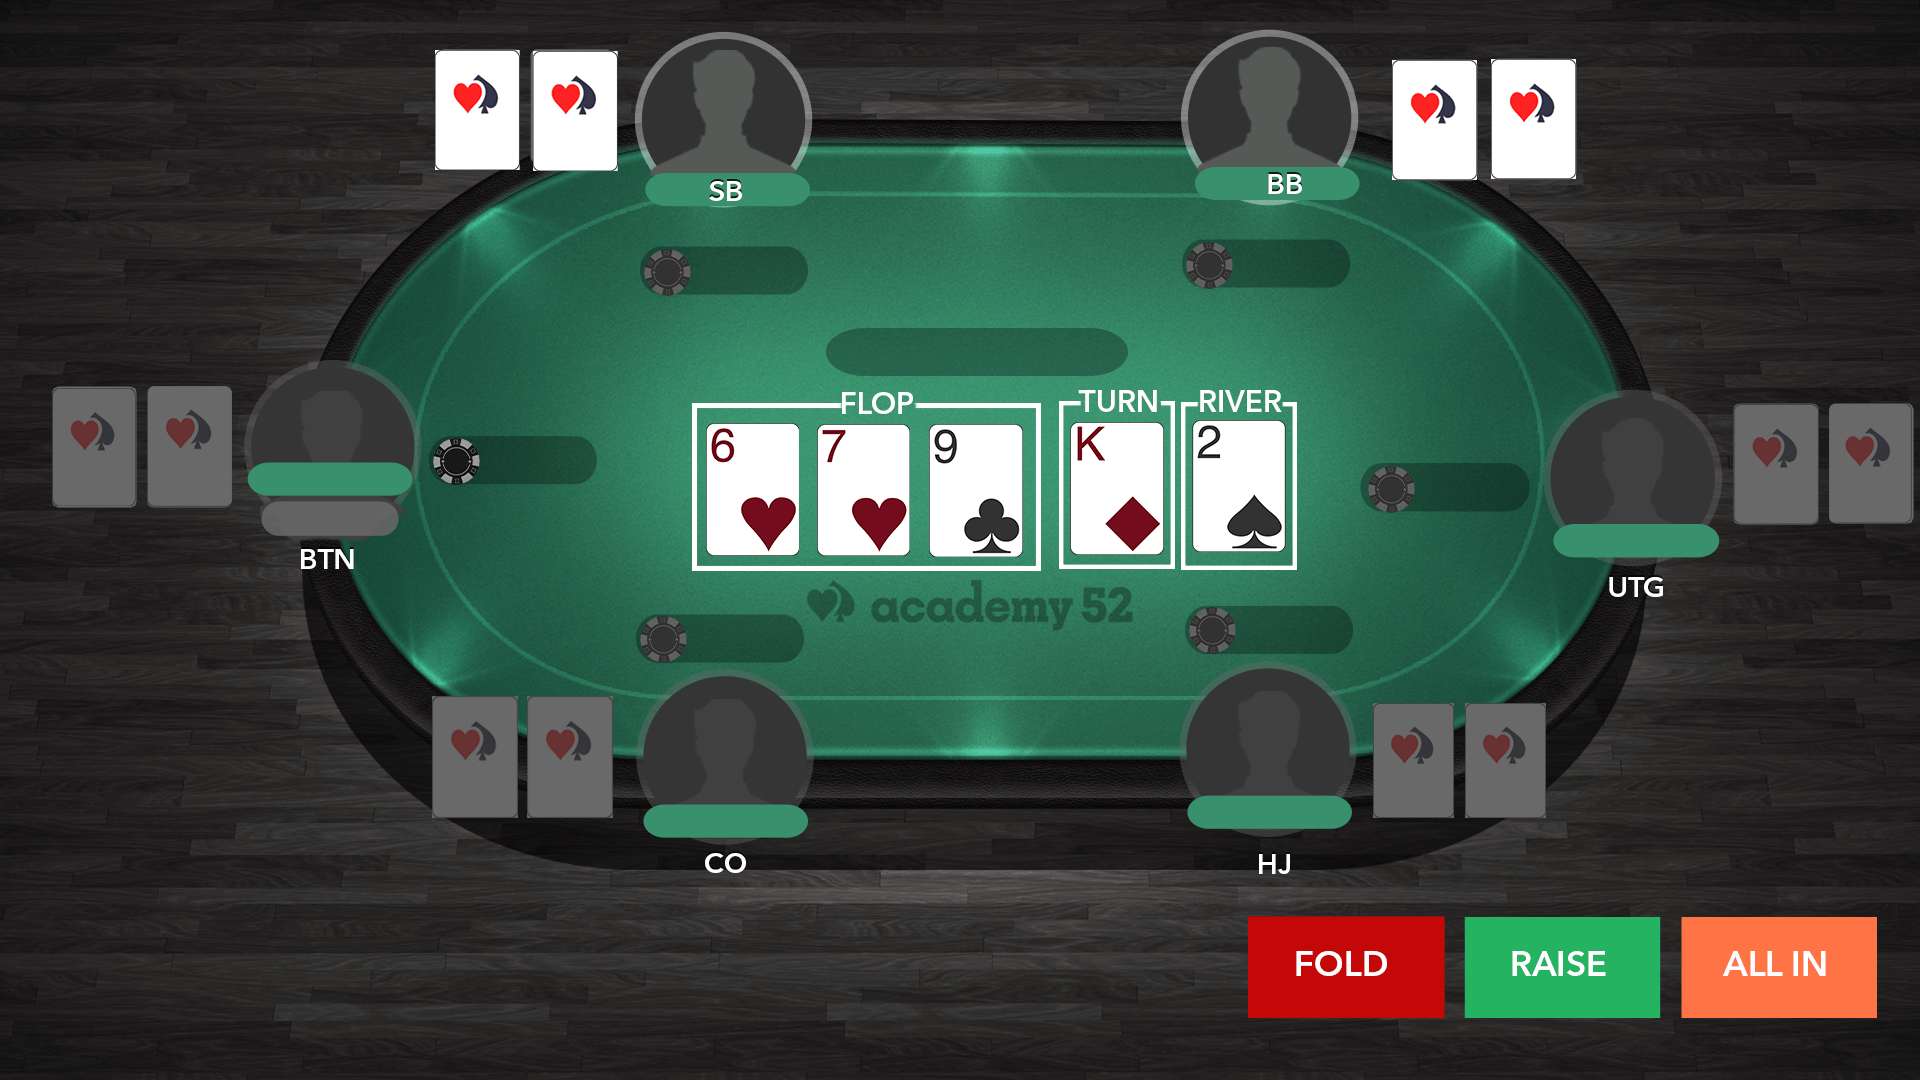 Ukuran Tumpukan dalam strategi HUNL |  Akademi Poker |  Akademi52